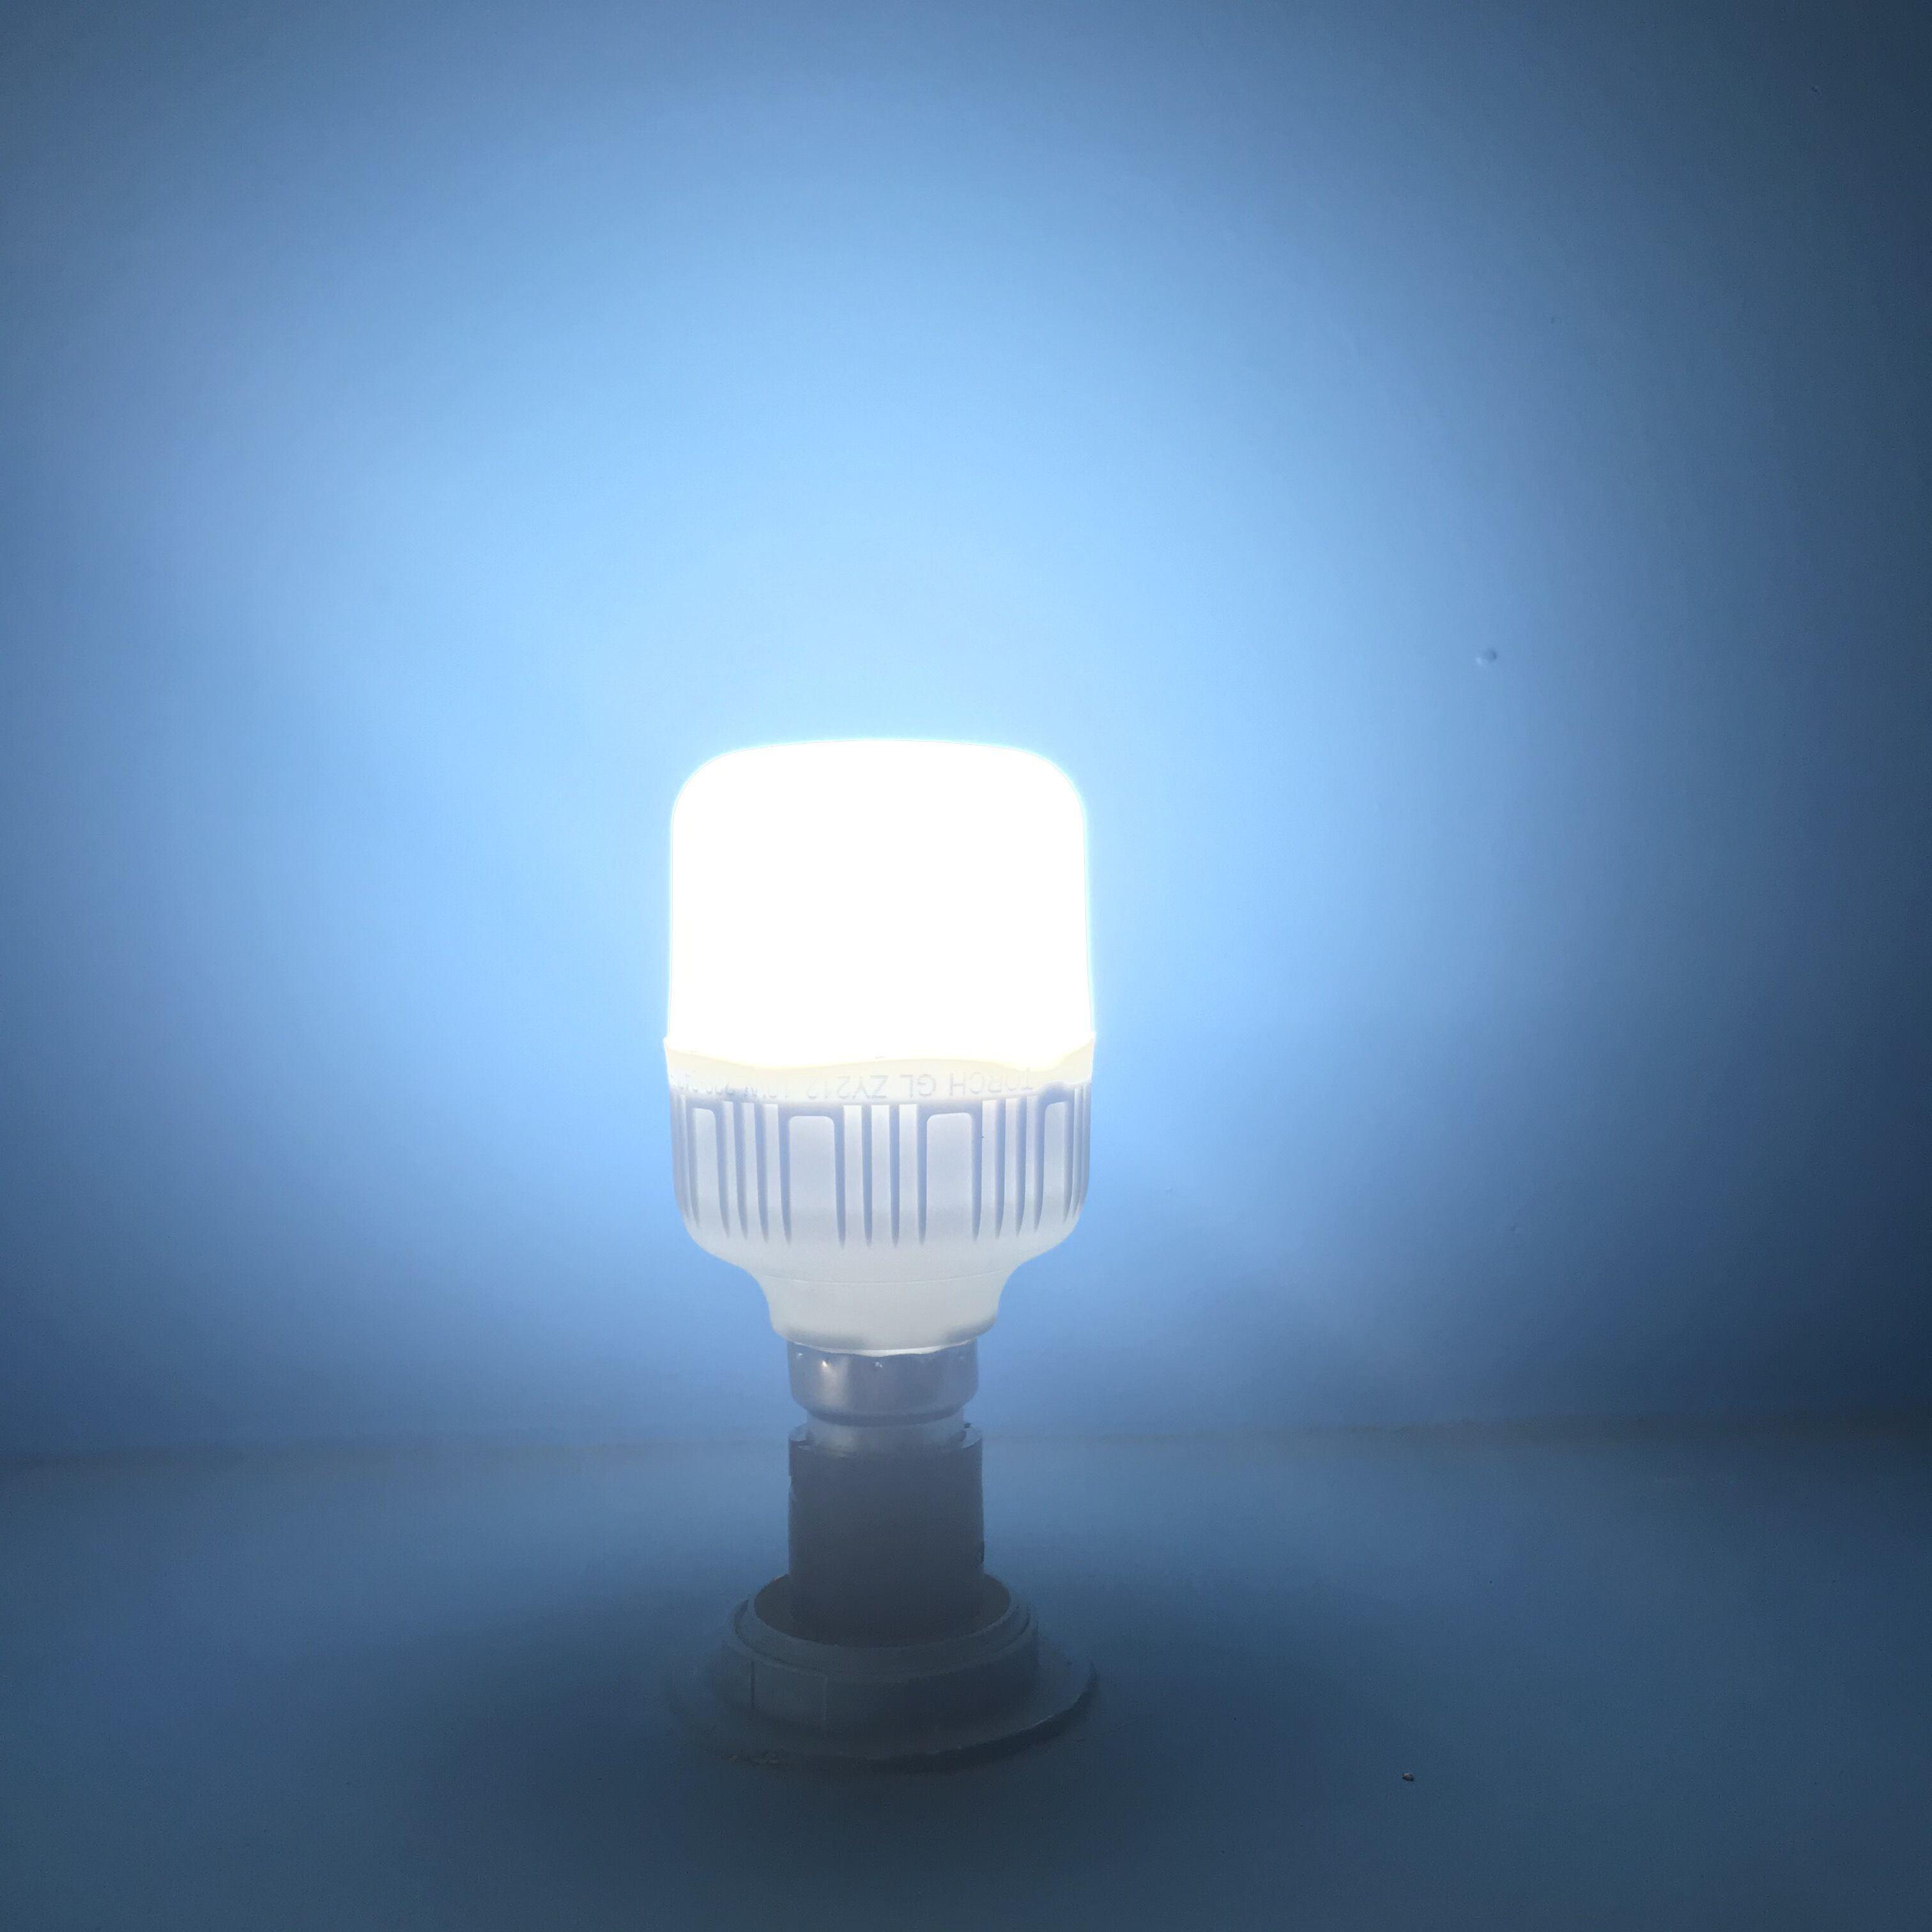 Blue Home light bulb